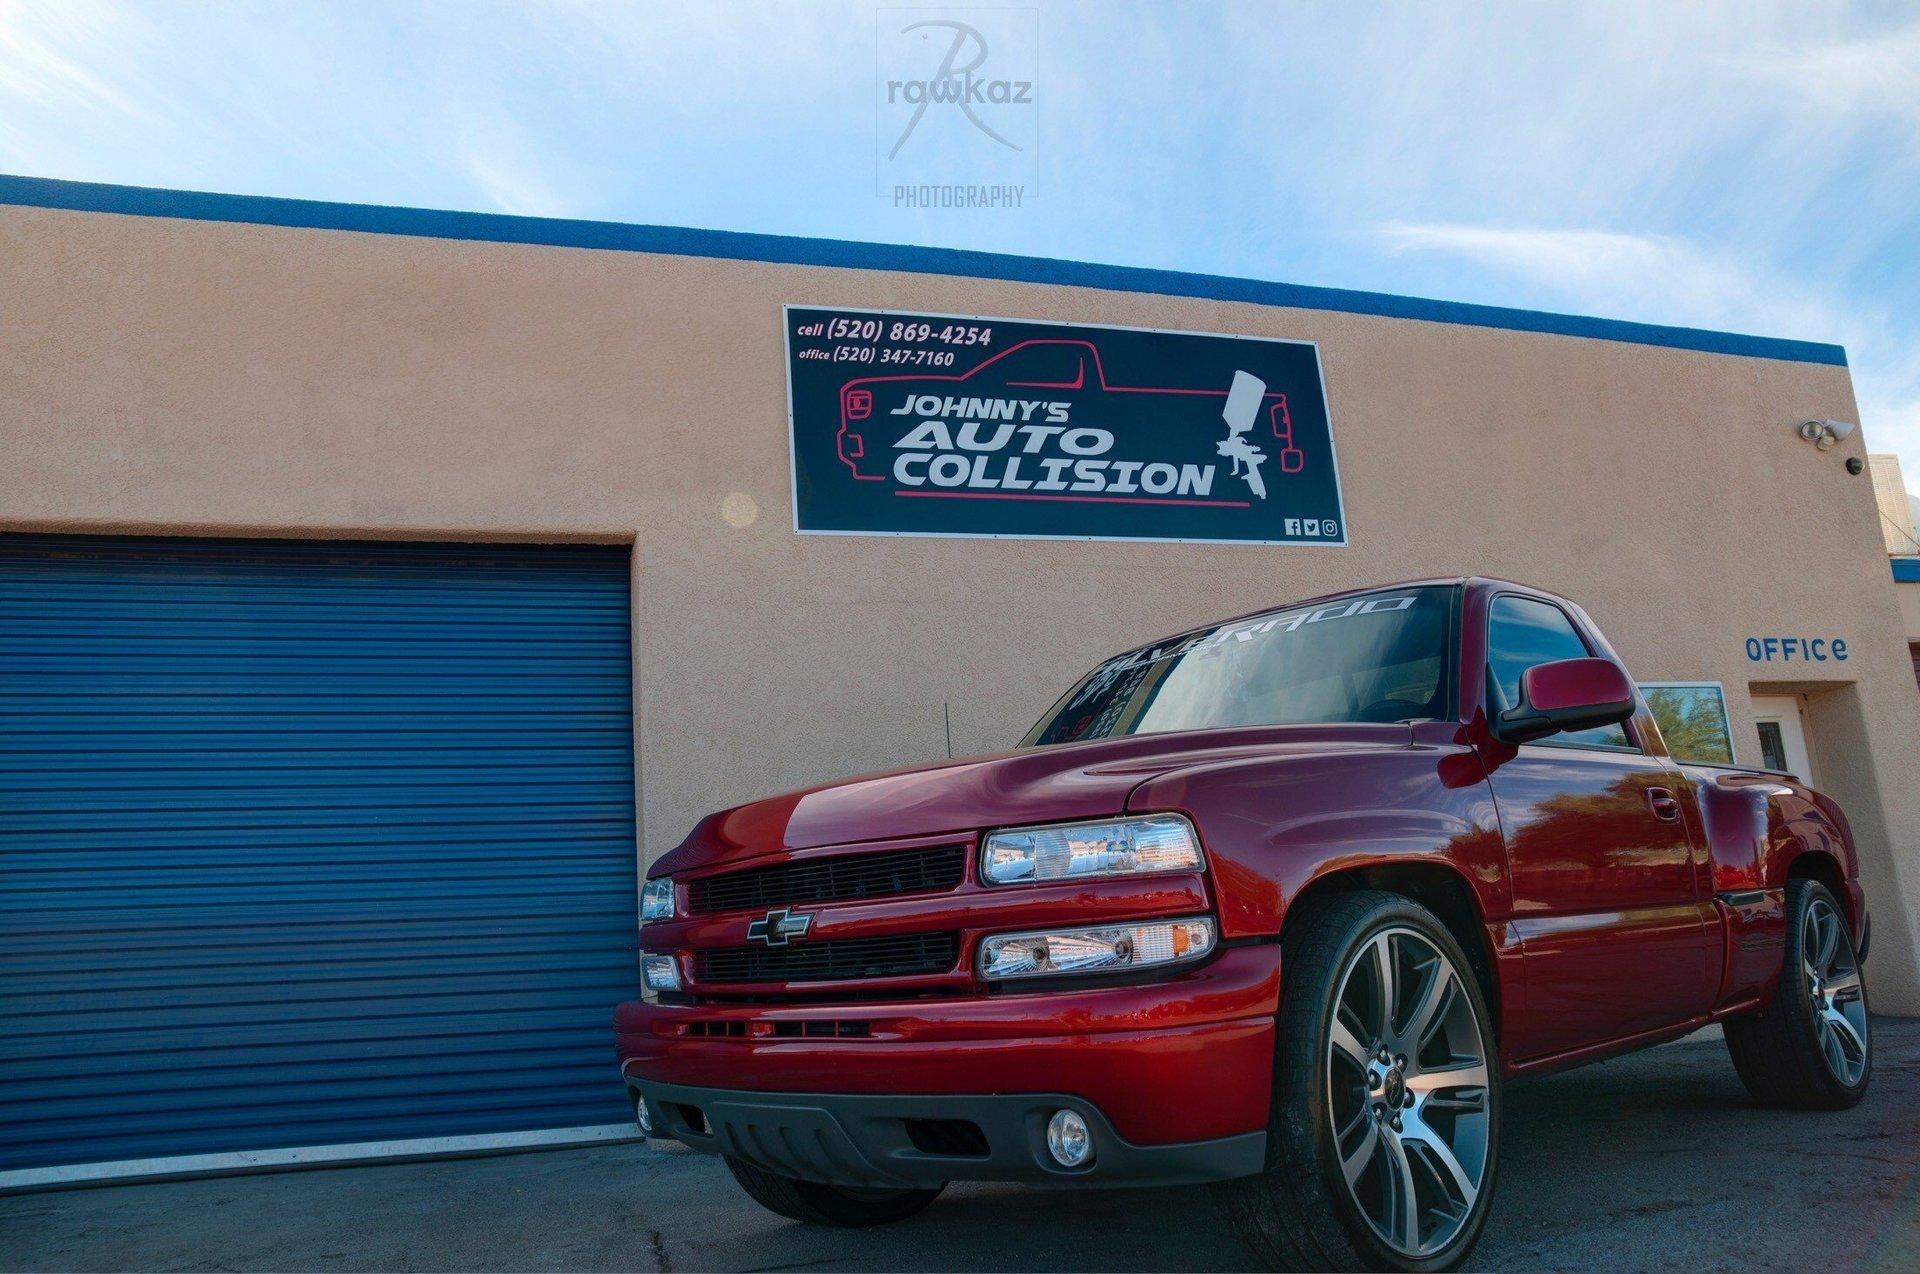 Johnny's Auto Collision image 5